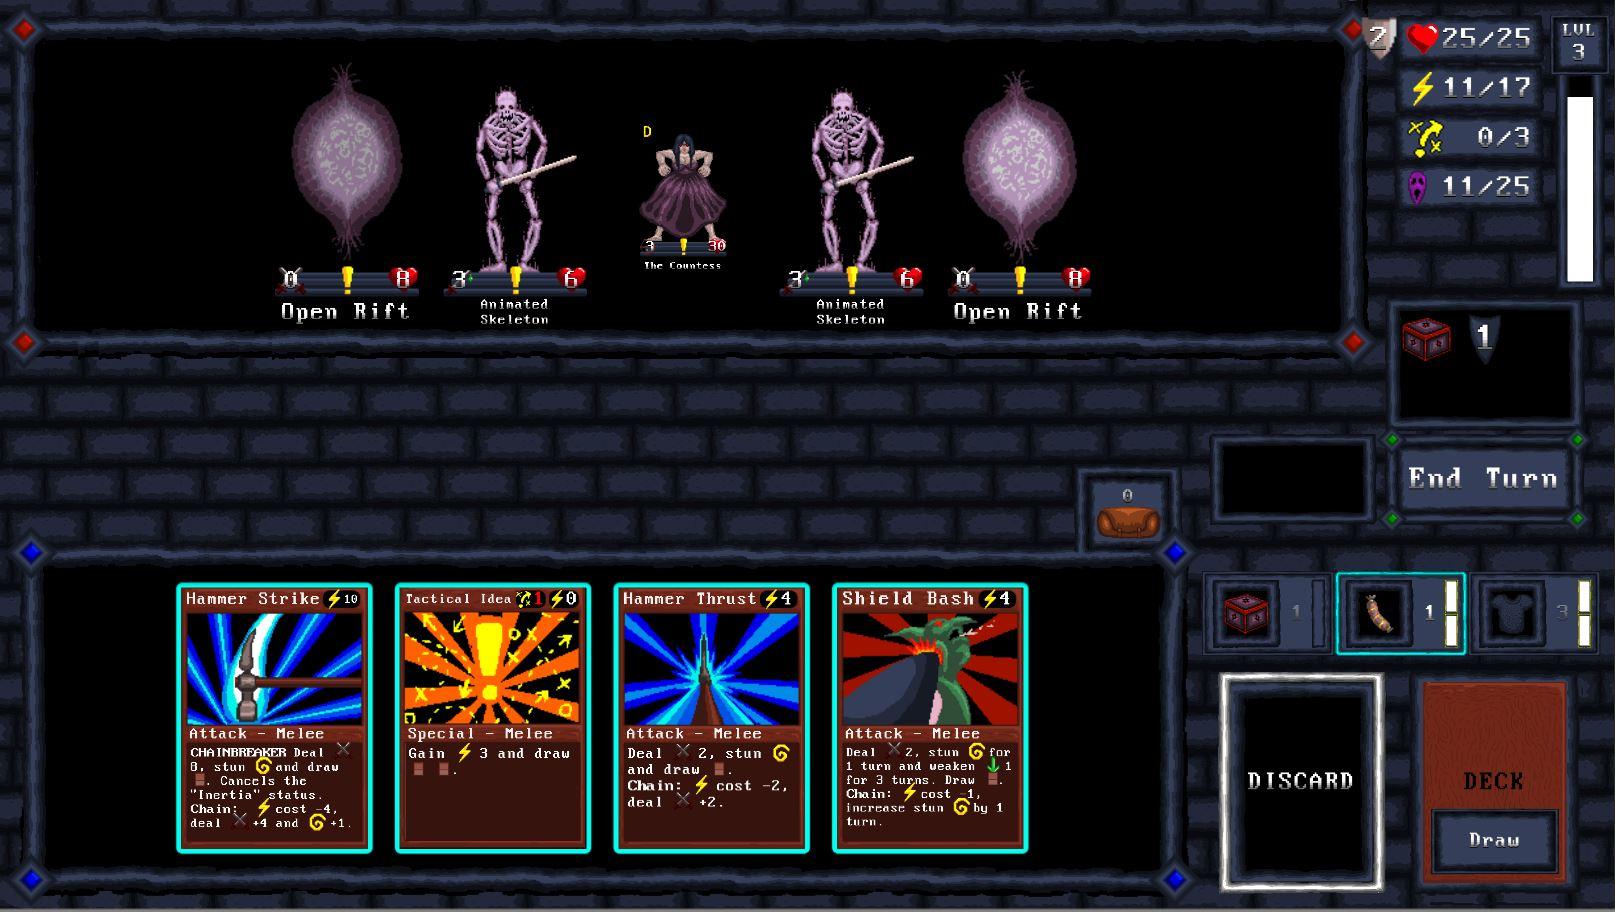 Card Quest Battle_Countess